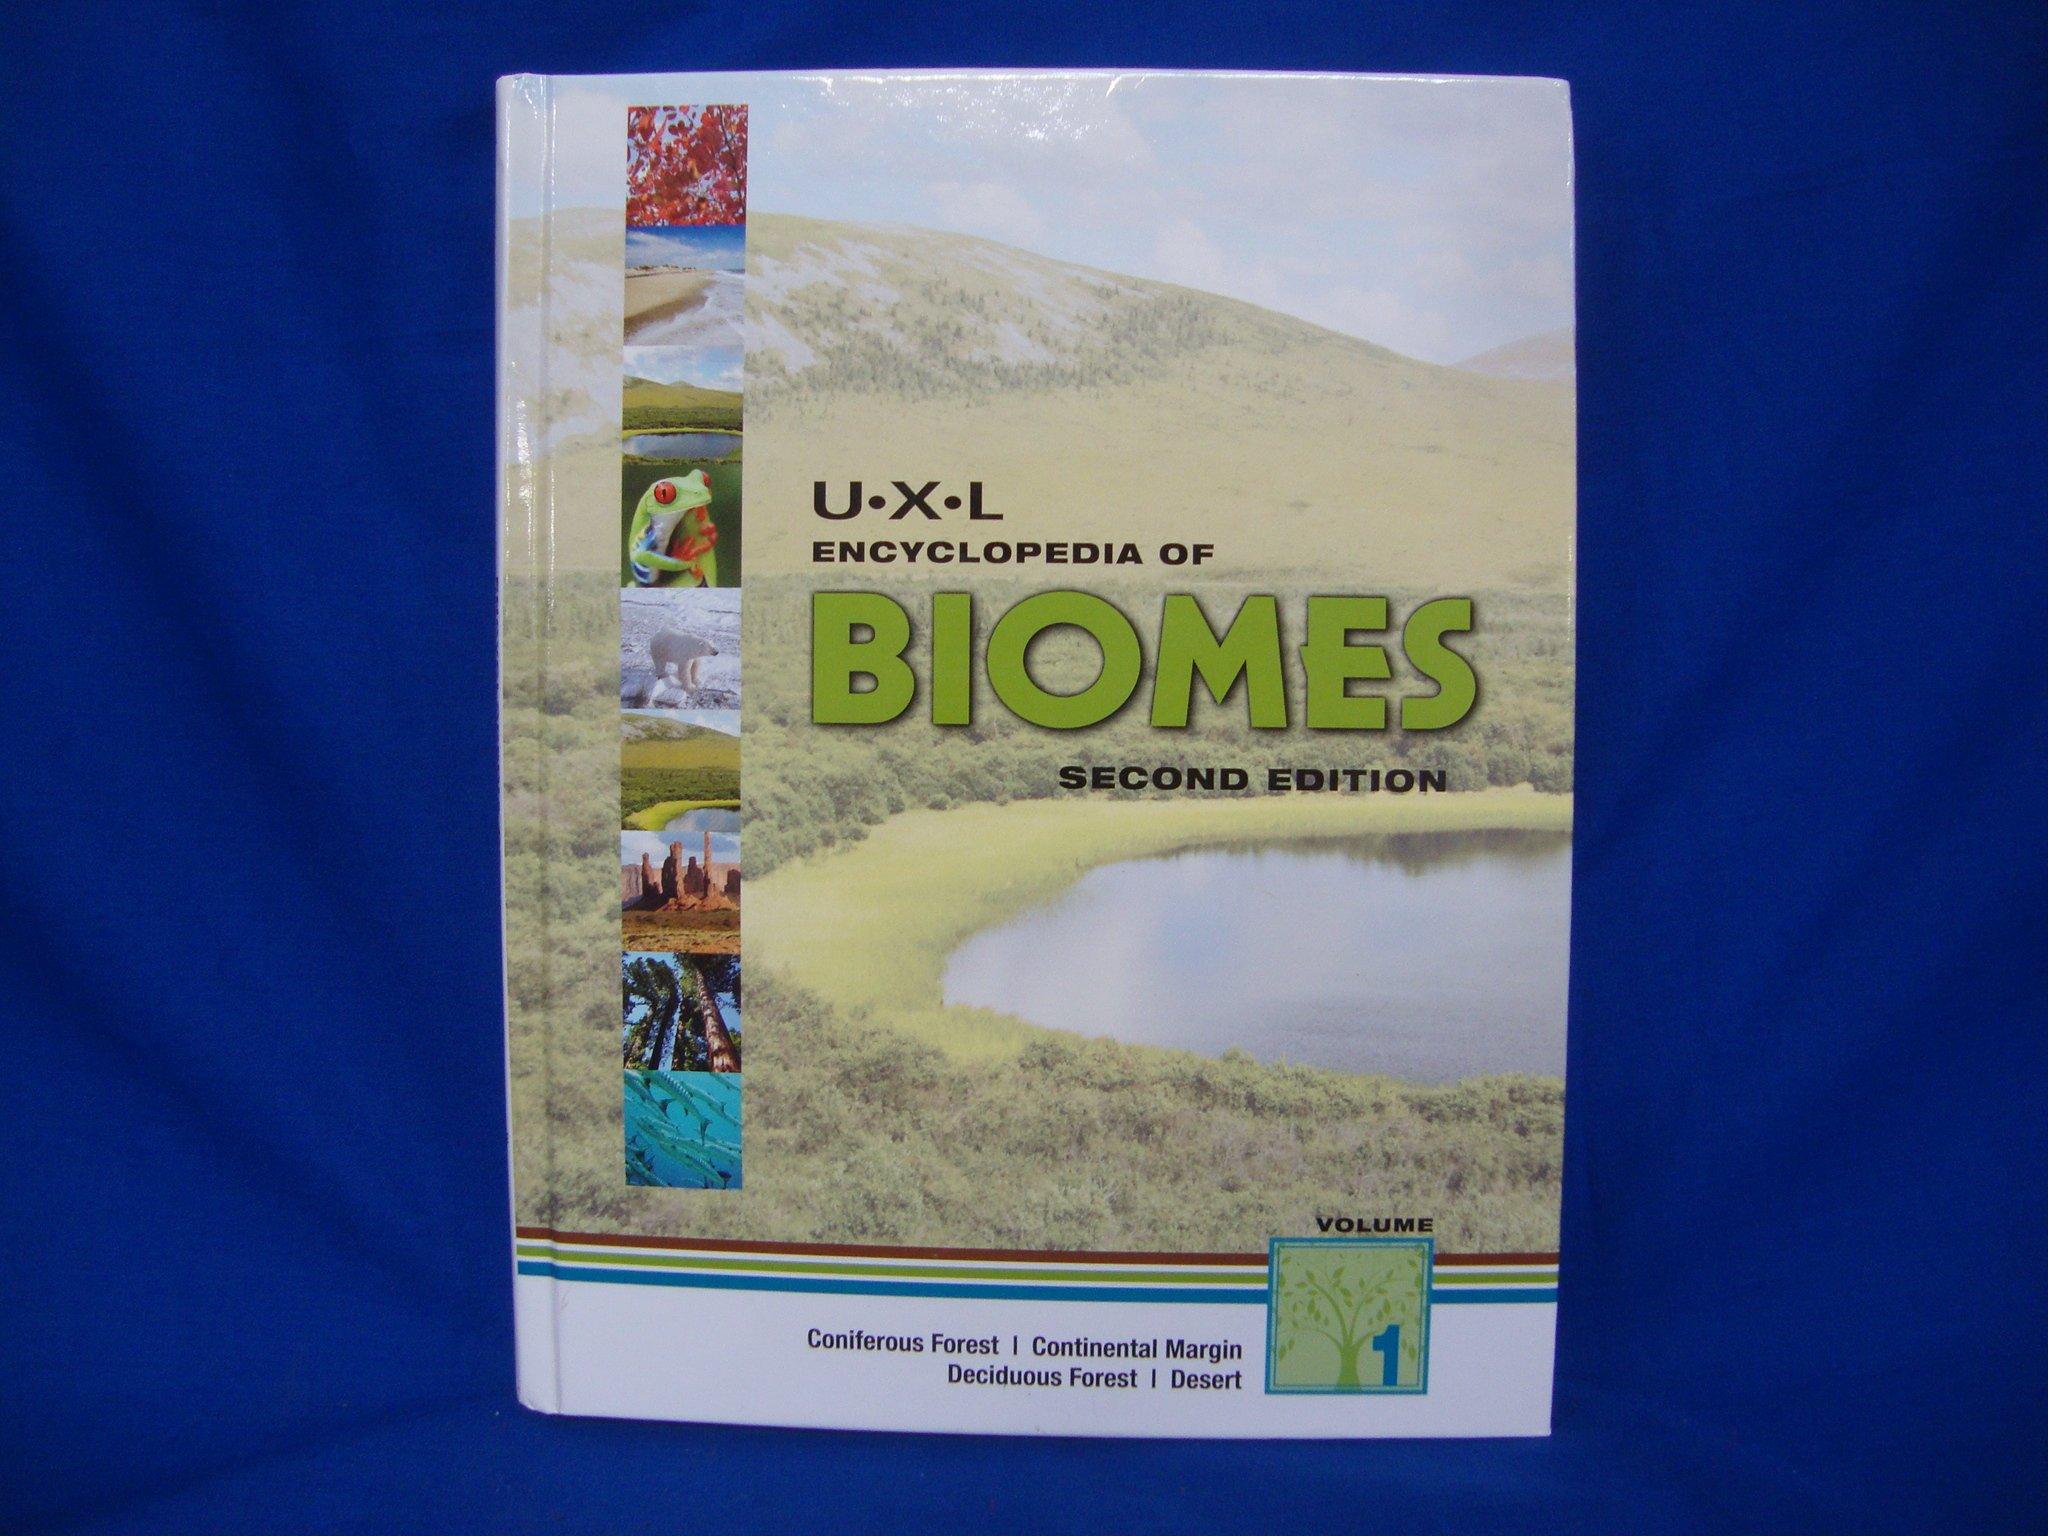 U-X-L Encyclopedia of Biomes, Second Edition, Volume 2